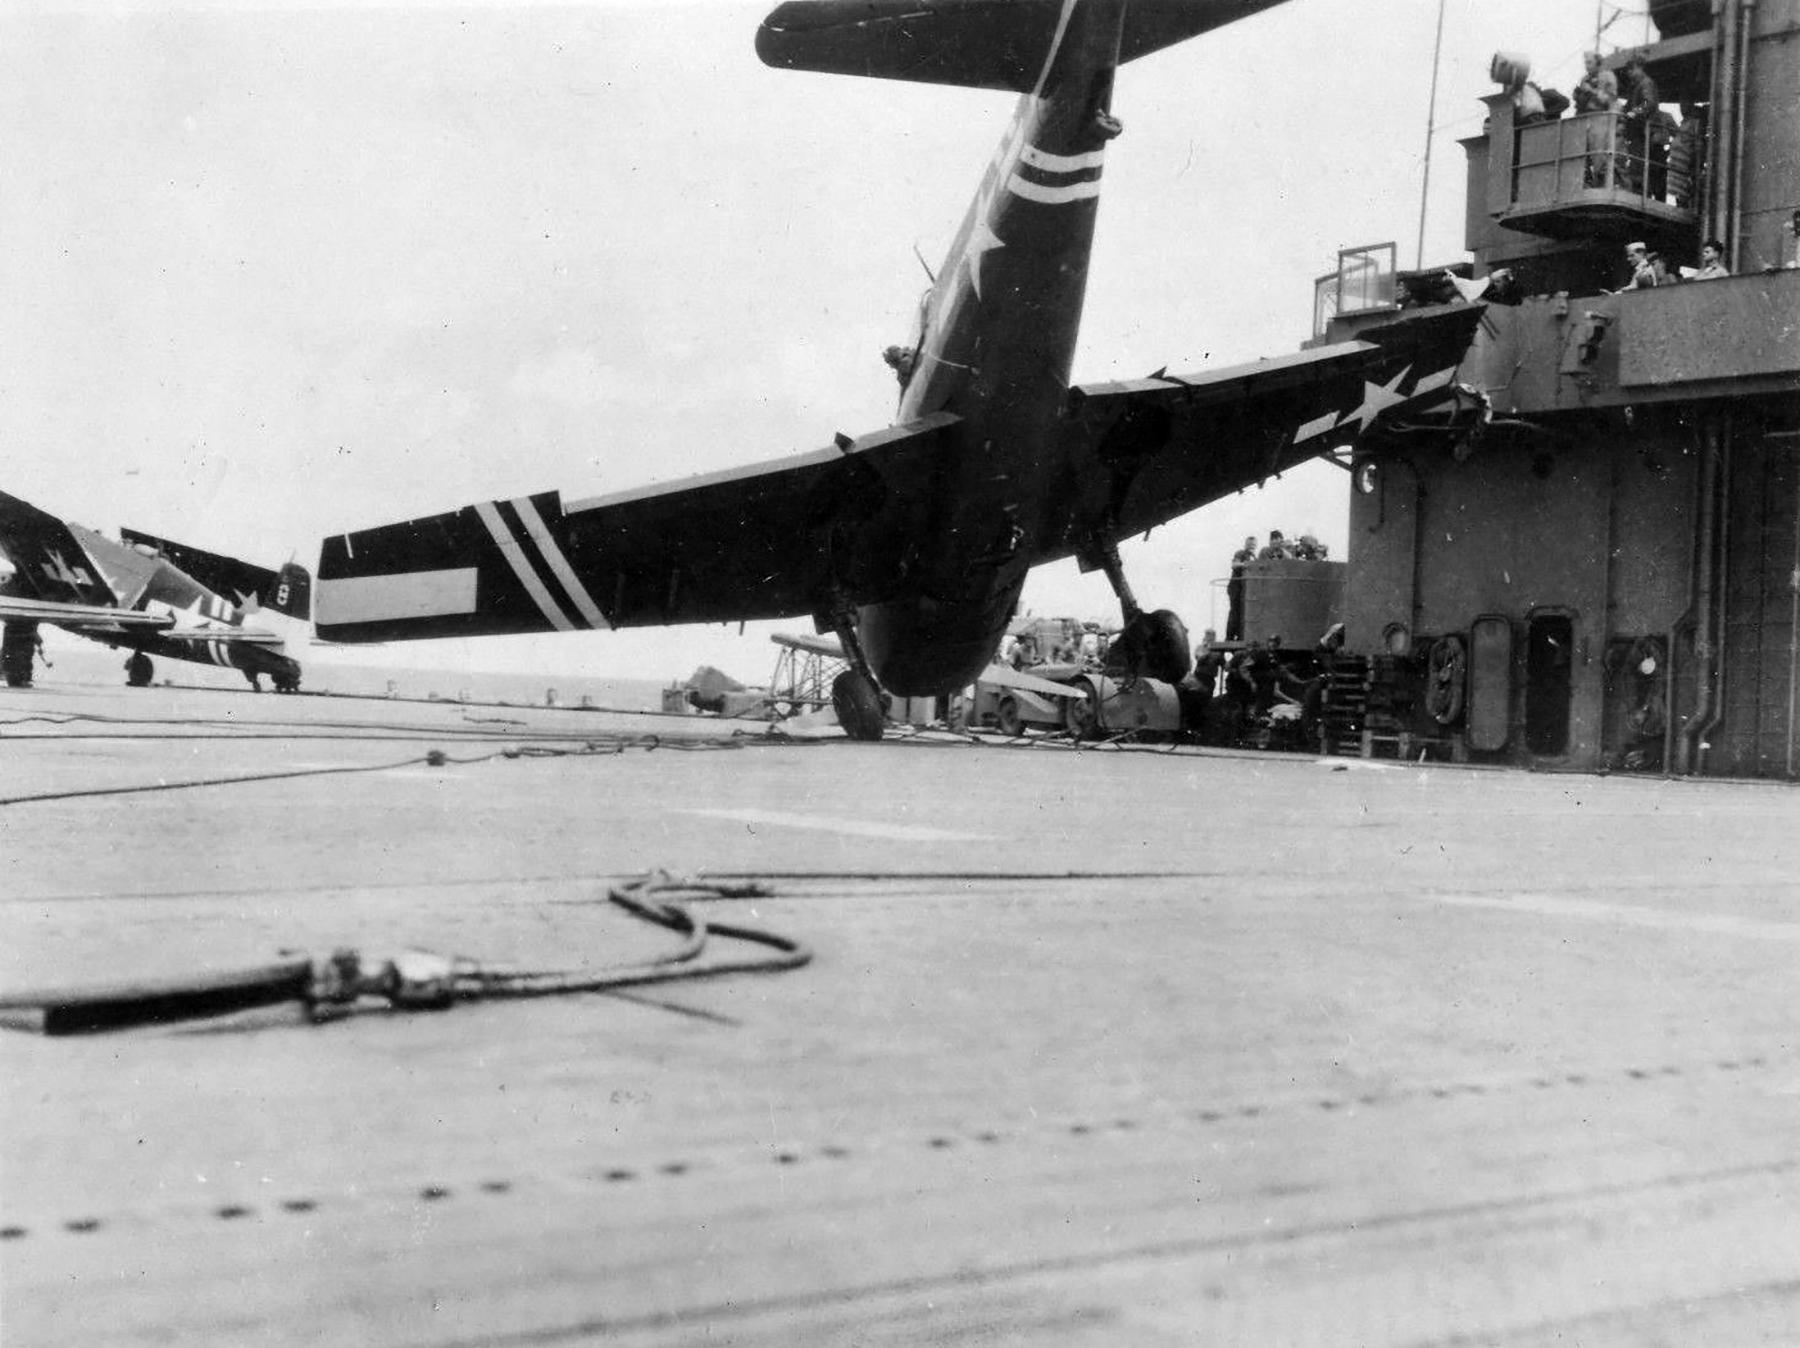 Grumman F6F 5 Hellcat VF 36 White 5 landing mishap CVE 112 USS Siboney Aug 1945 May 1946 03